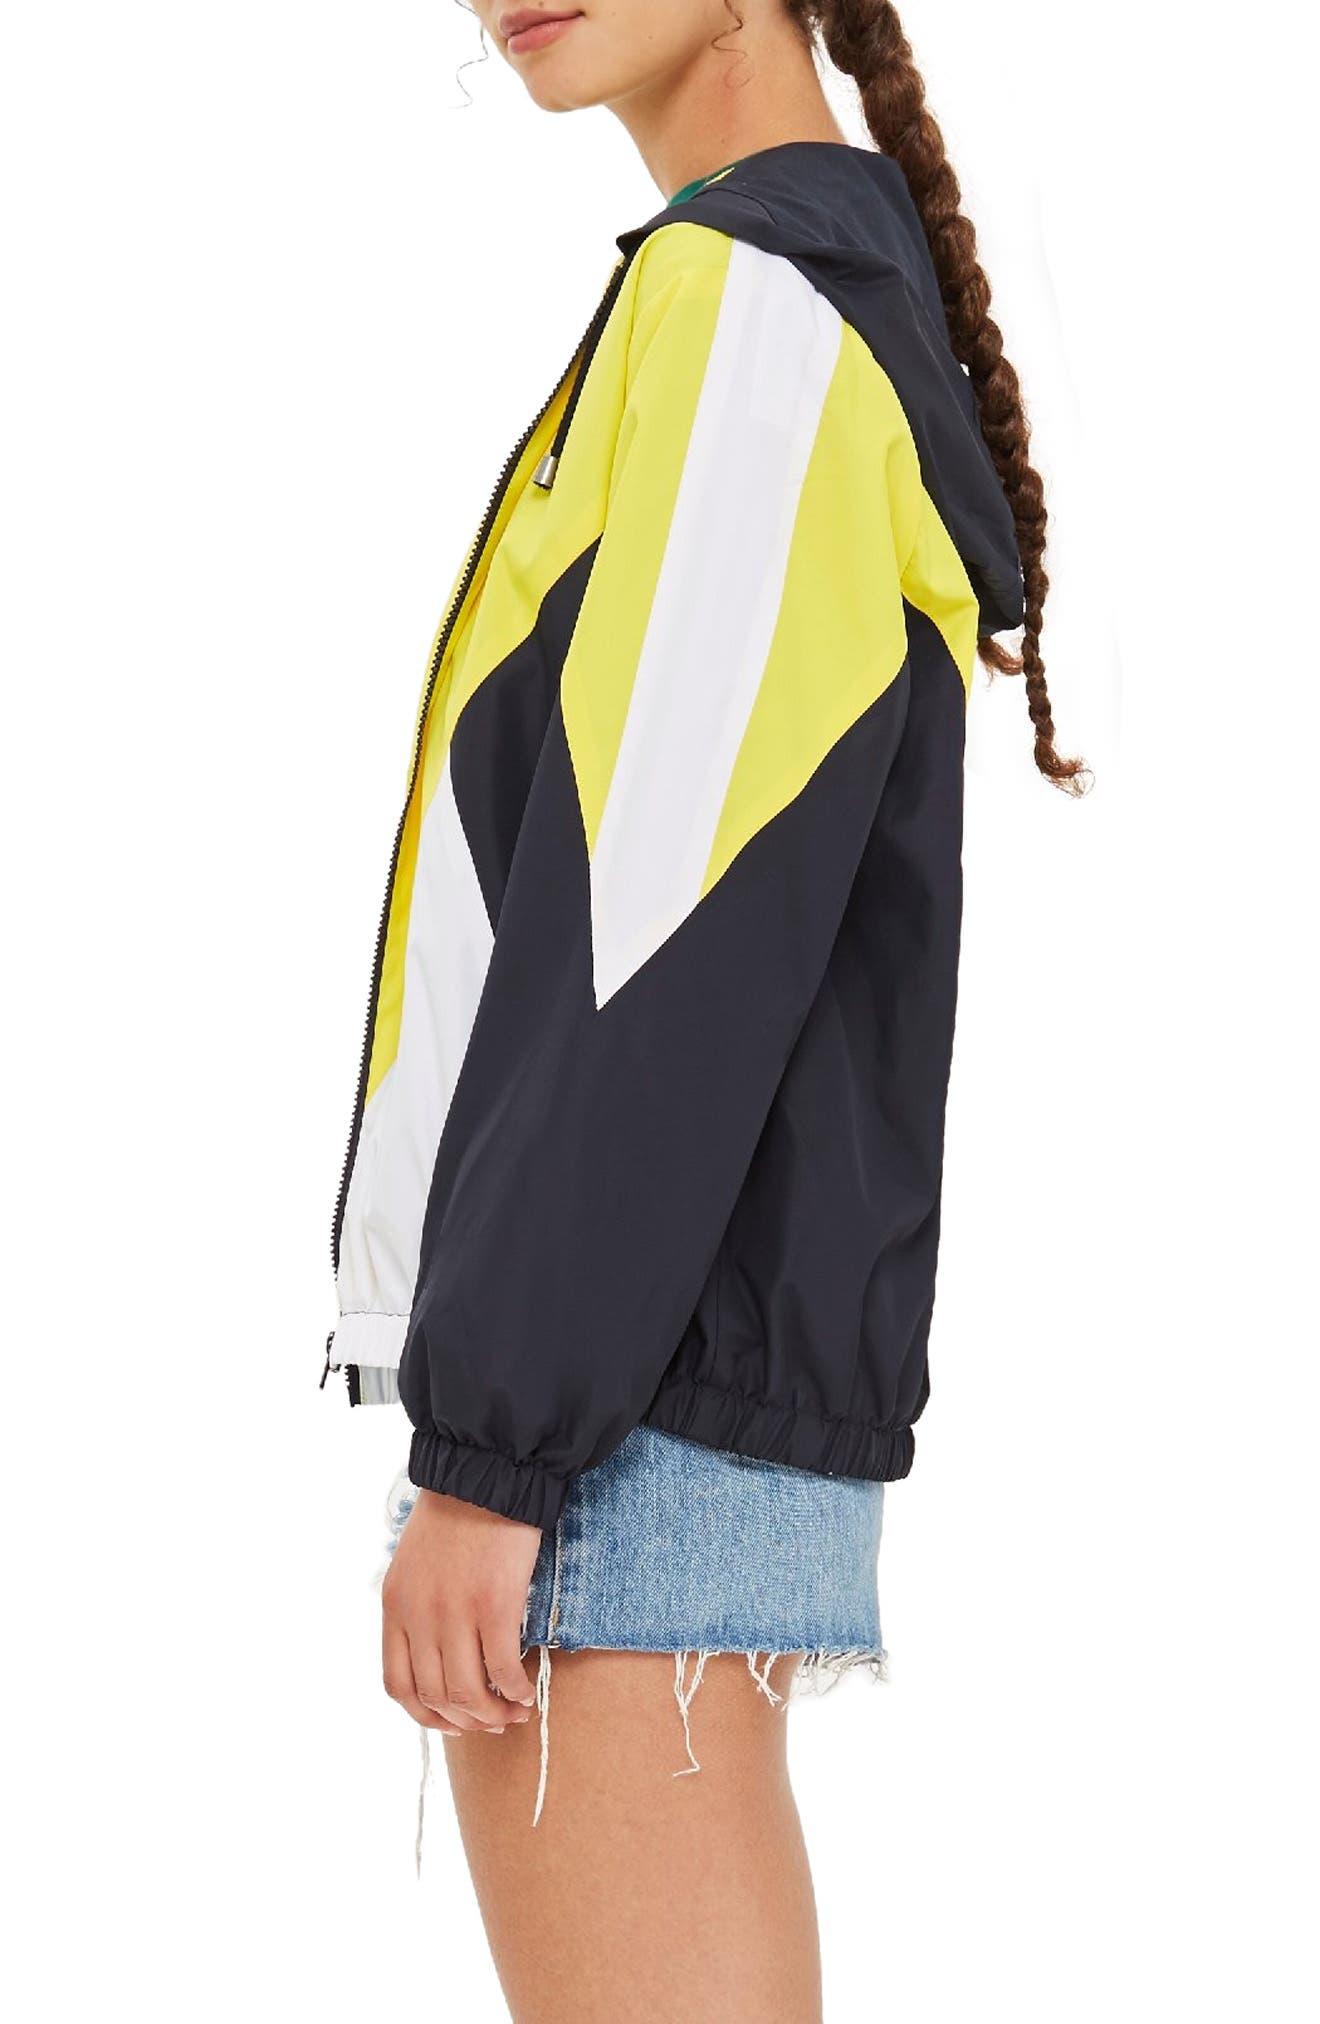 Texas Colorblock Windbreaker Jacket,                             Alternate thumbnail 3, color,                             YELLOW MULTI